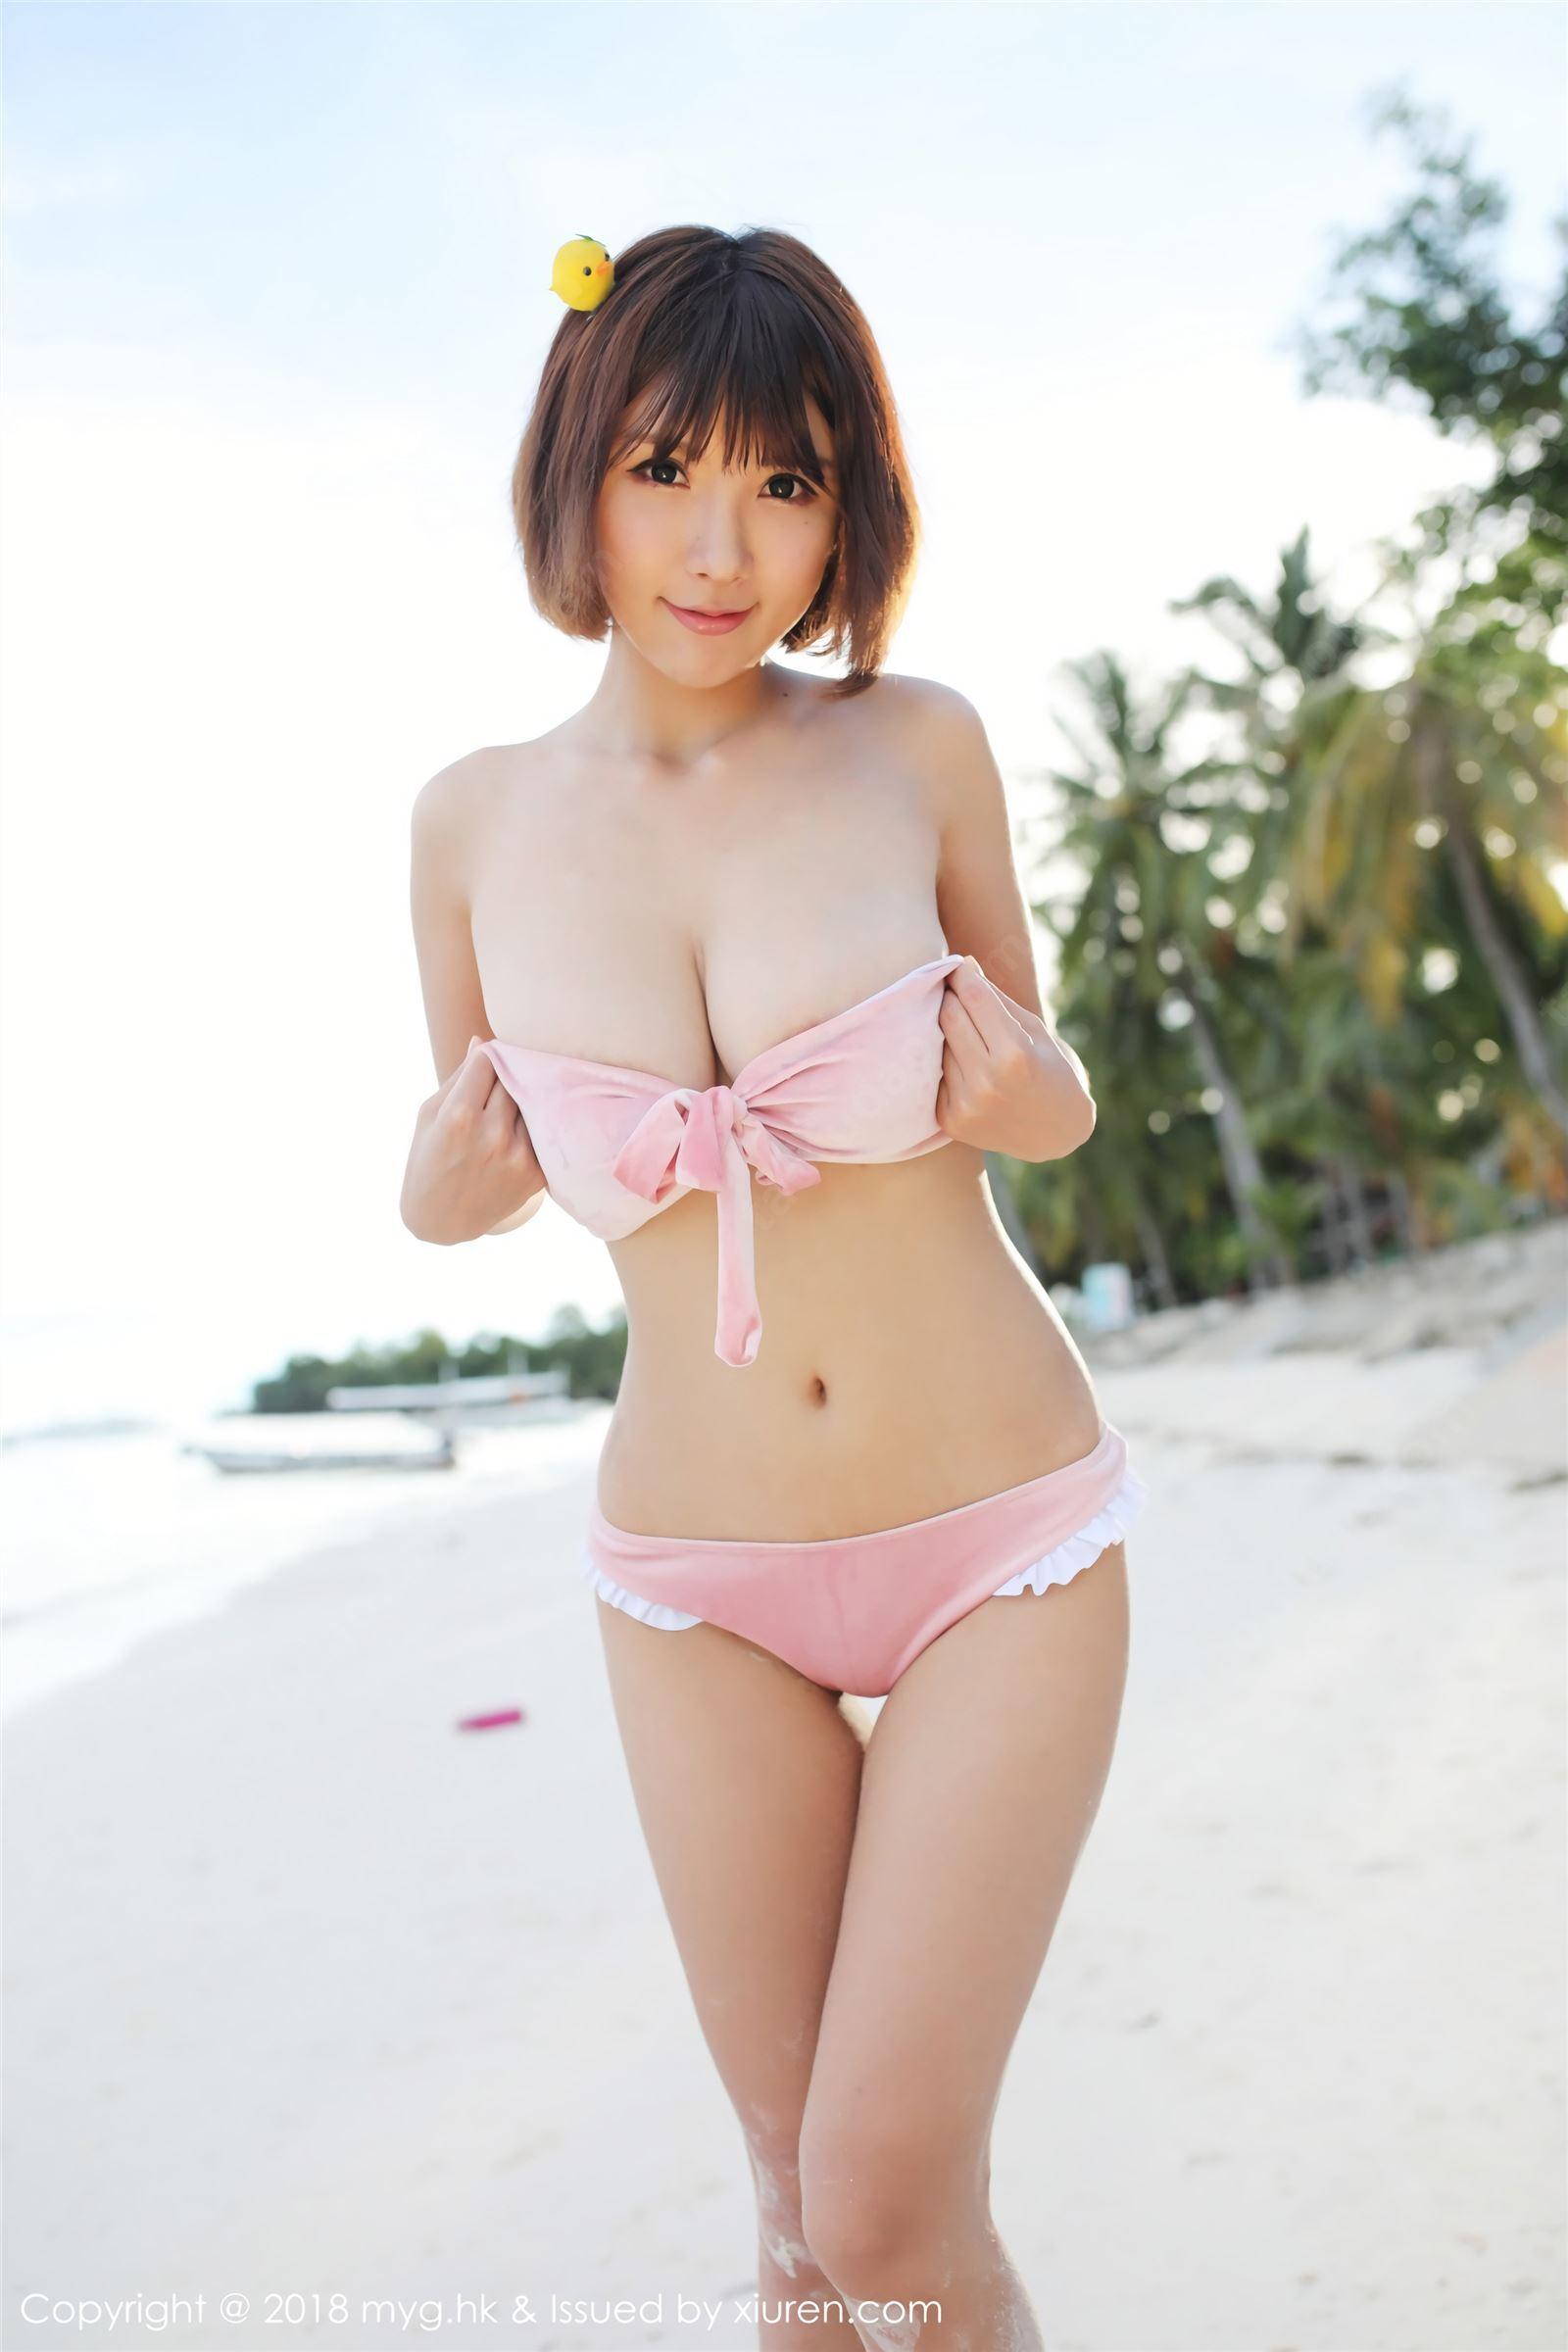 MyGirl 美媛馆 2018.08.27 VOL.308 晓茜sunny